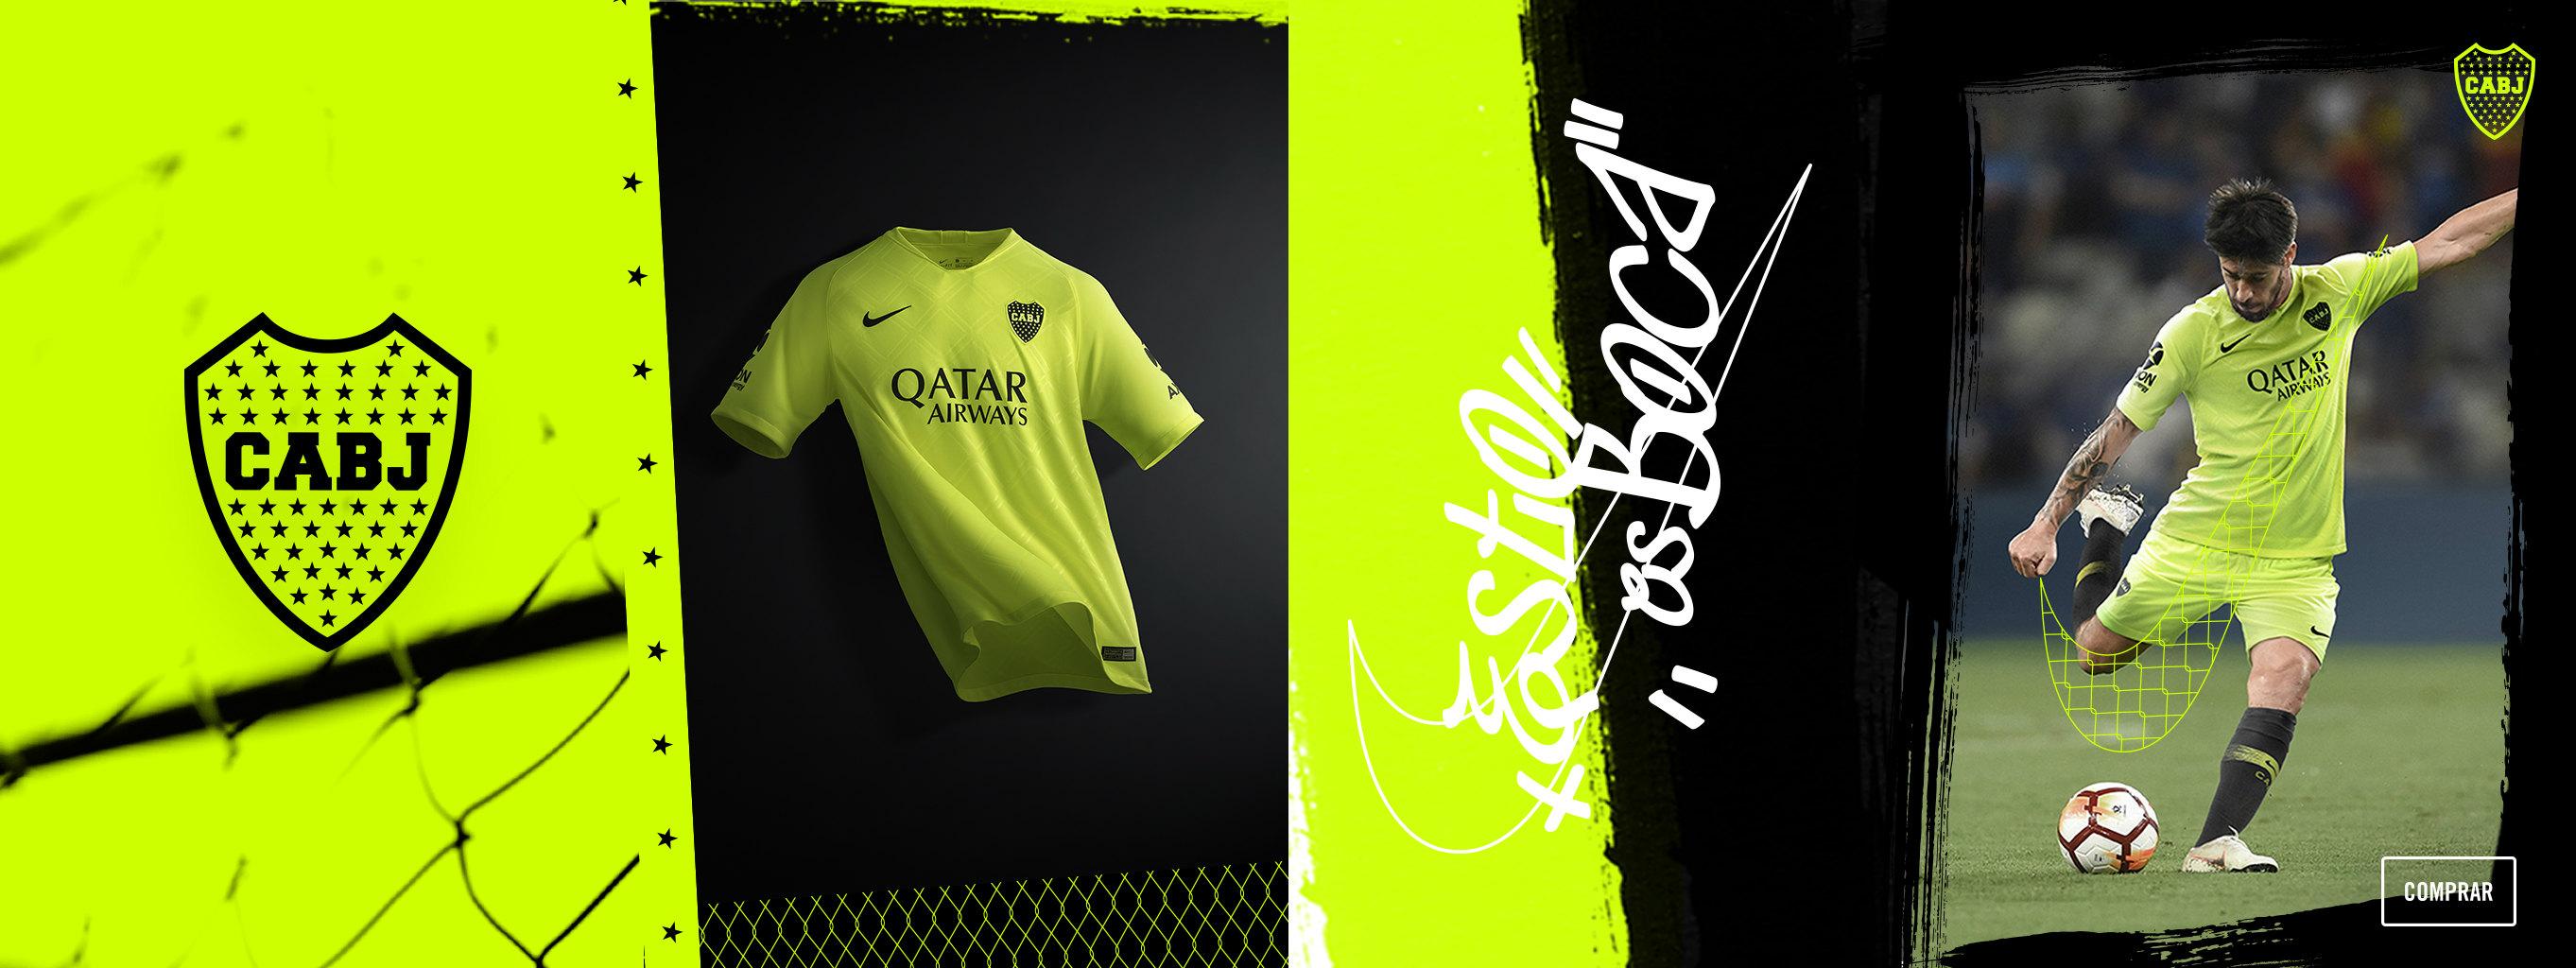 Liverpool fc 2019 12 third kit boca